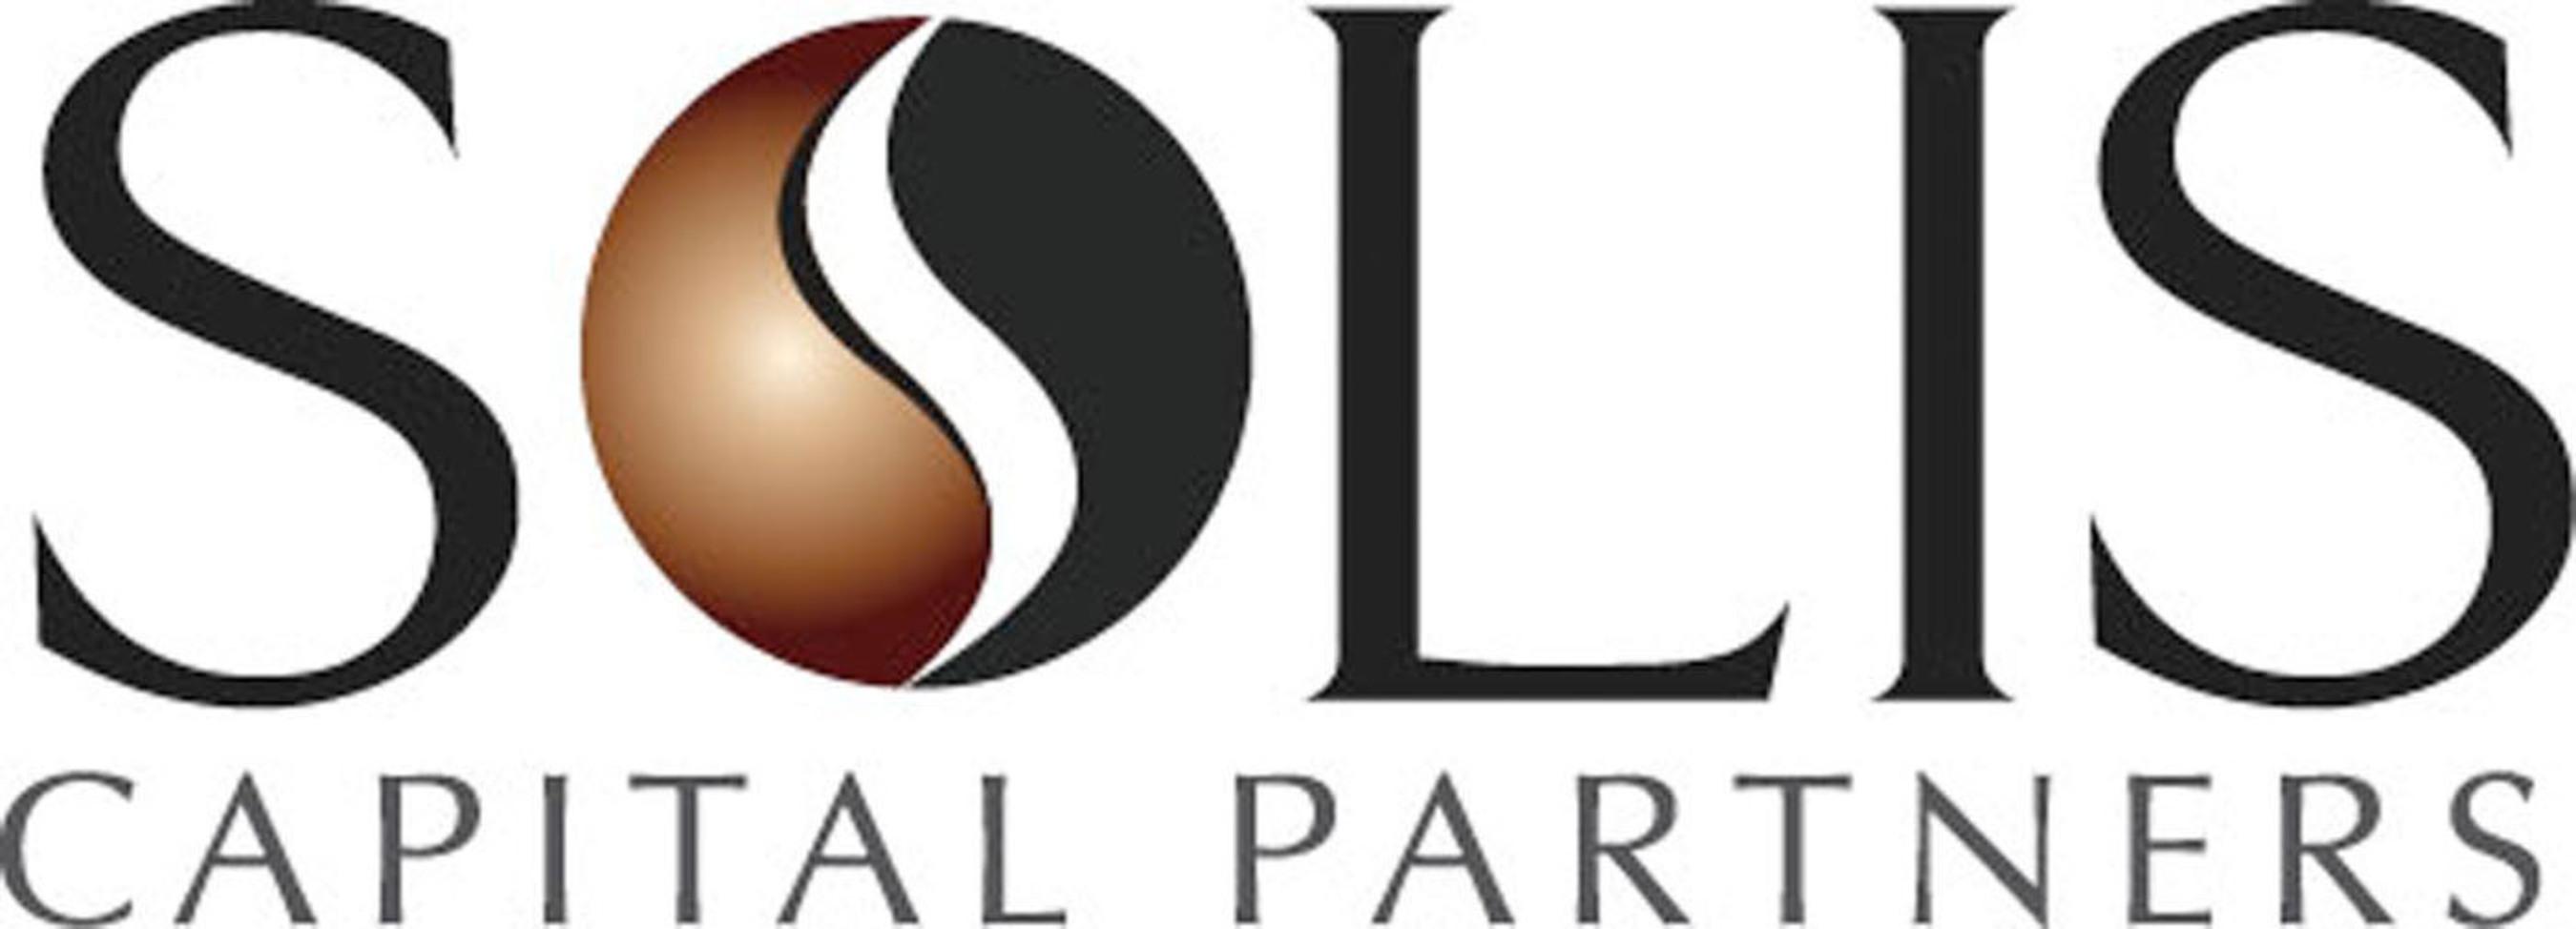 Solis Capital Partners